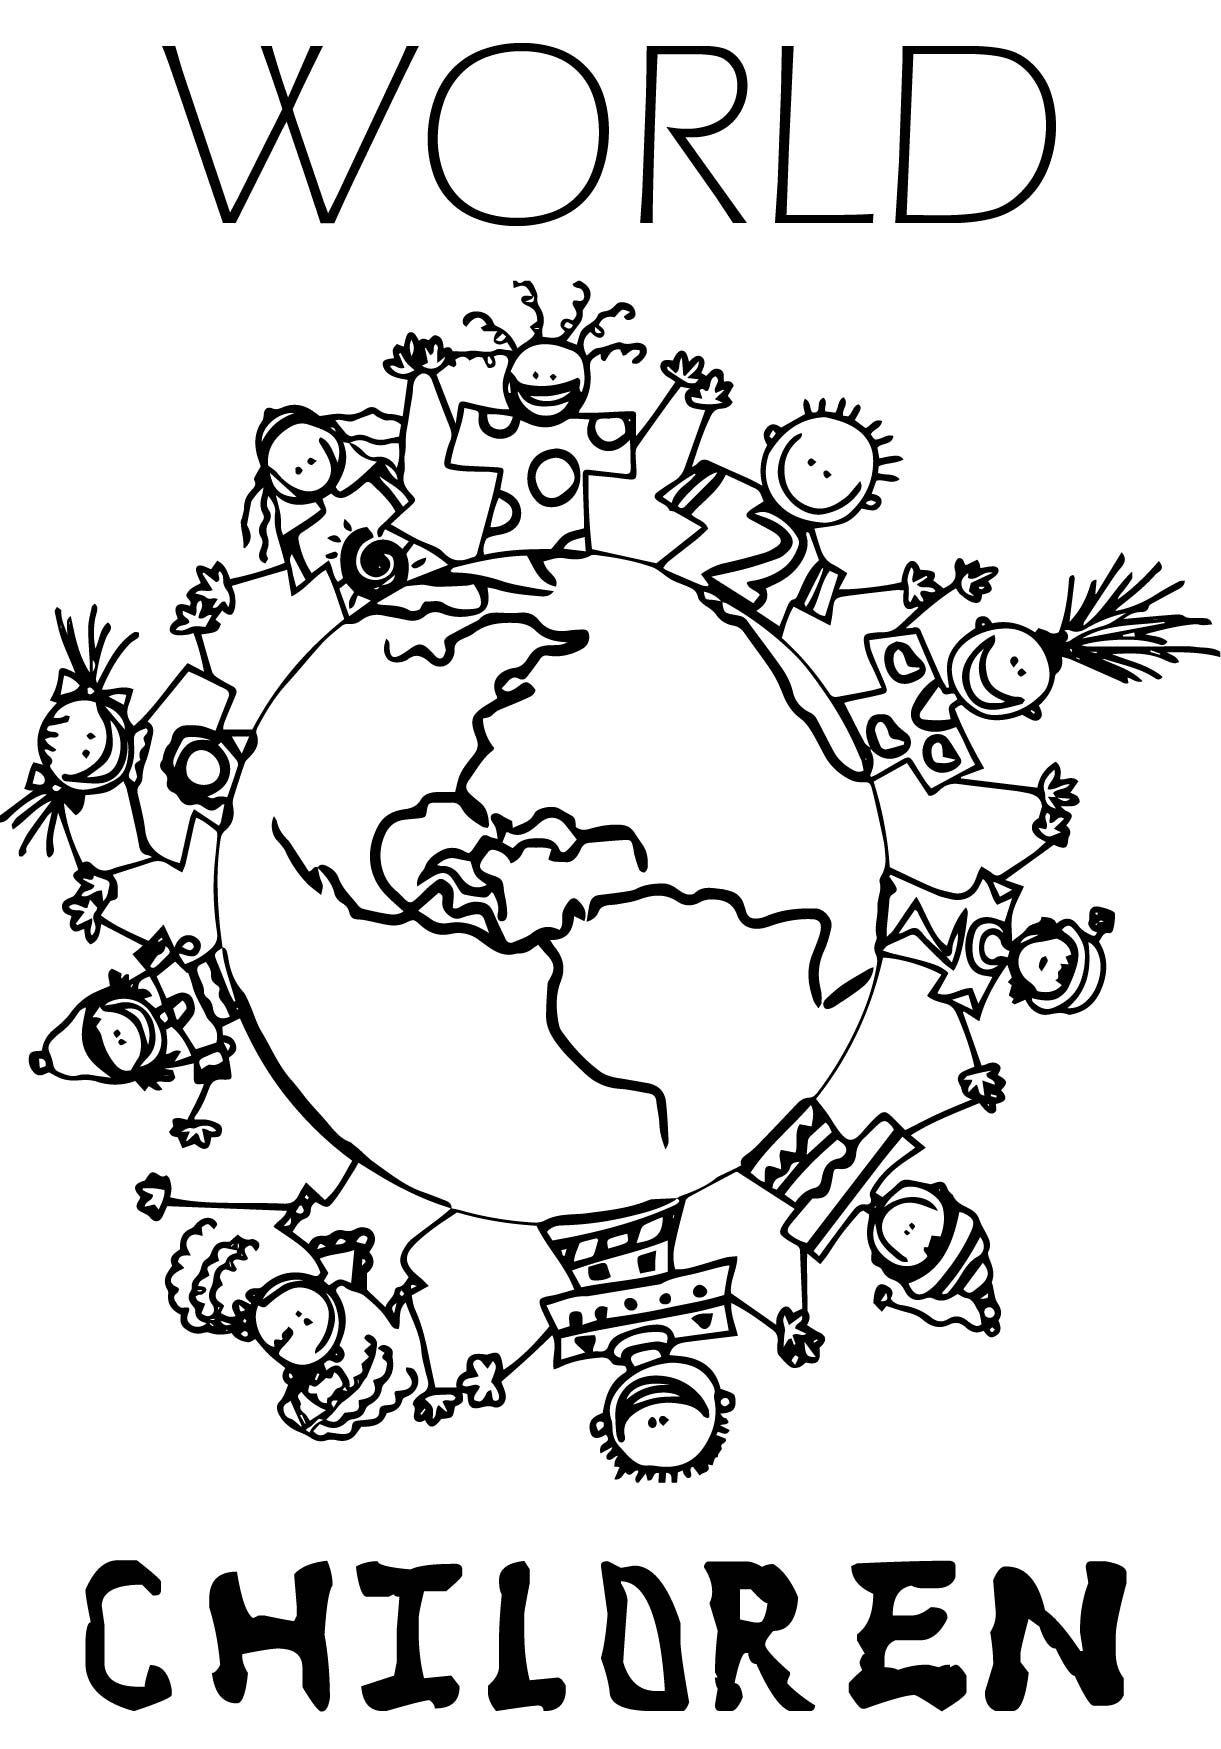 Children Holding Hands Around World Coloring Page Cute Children